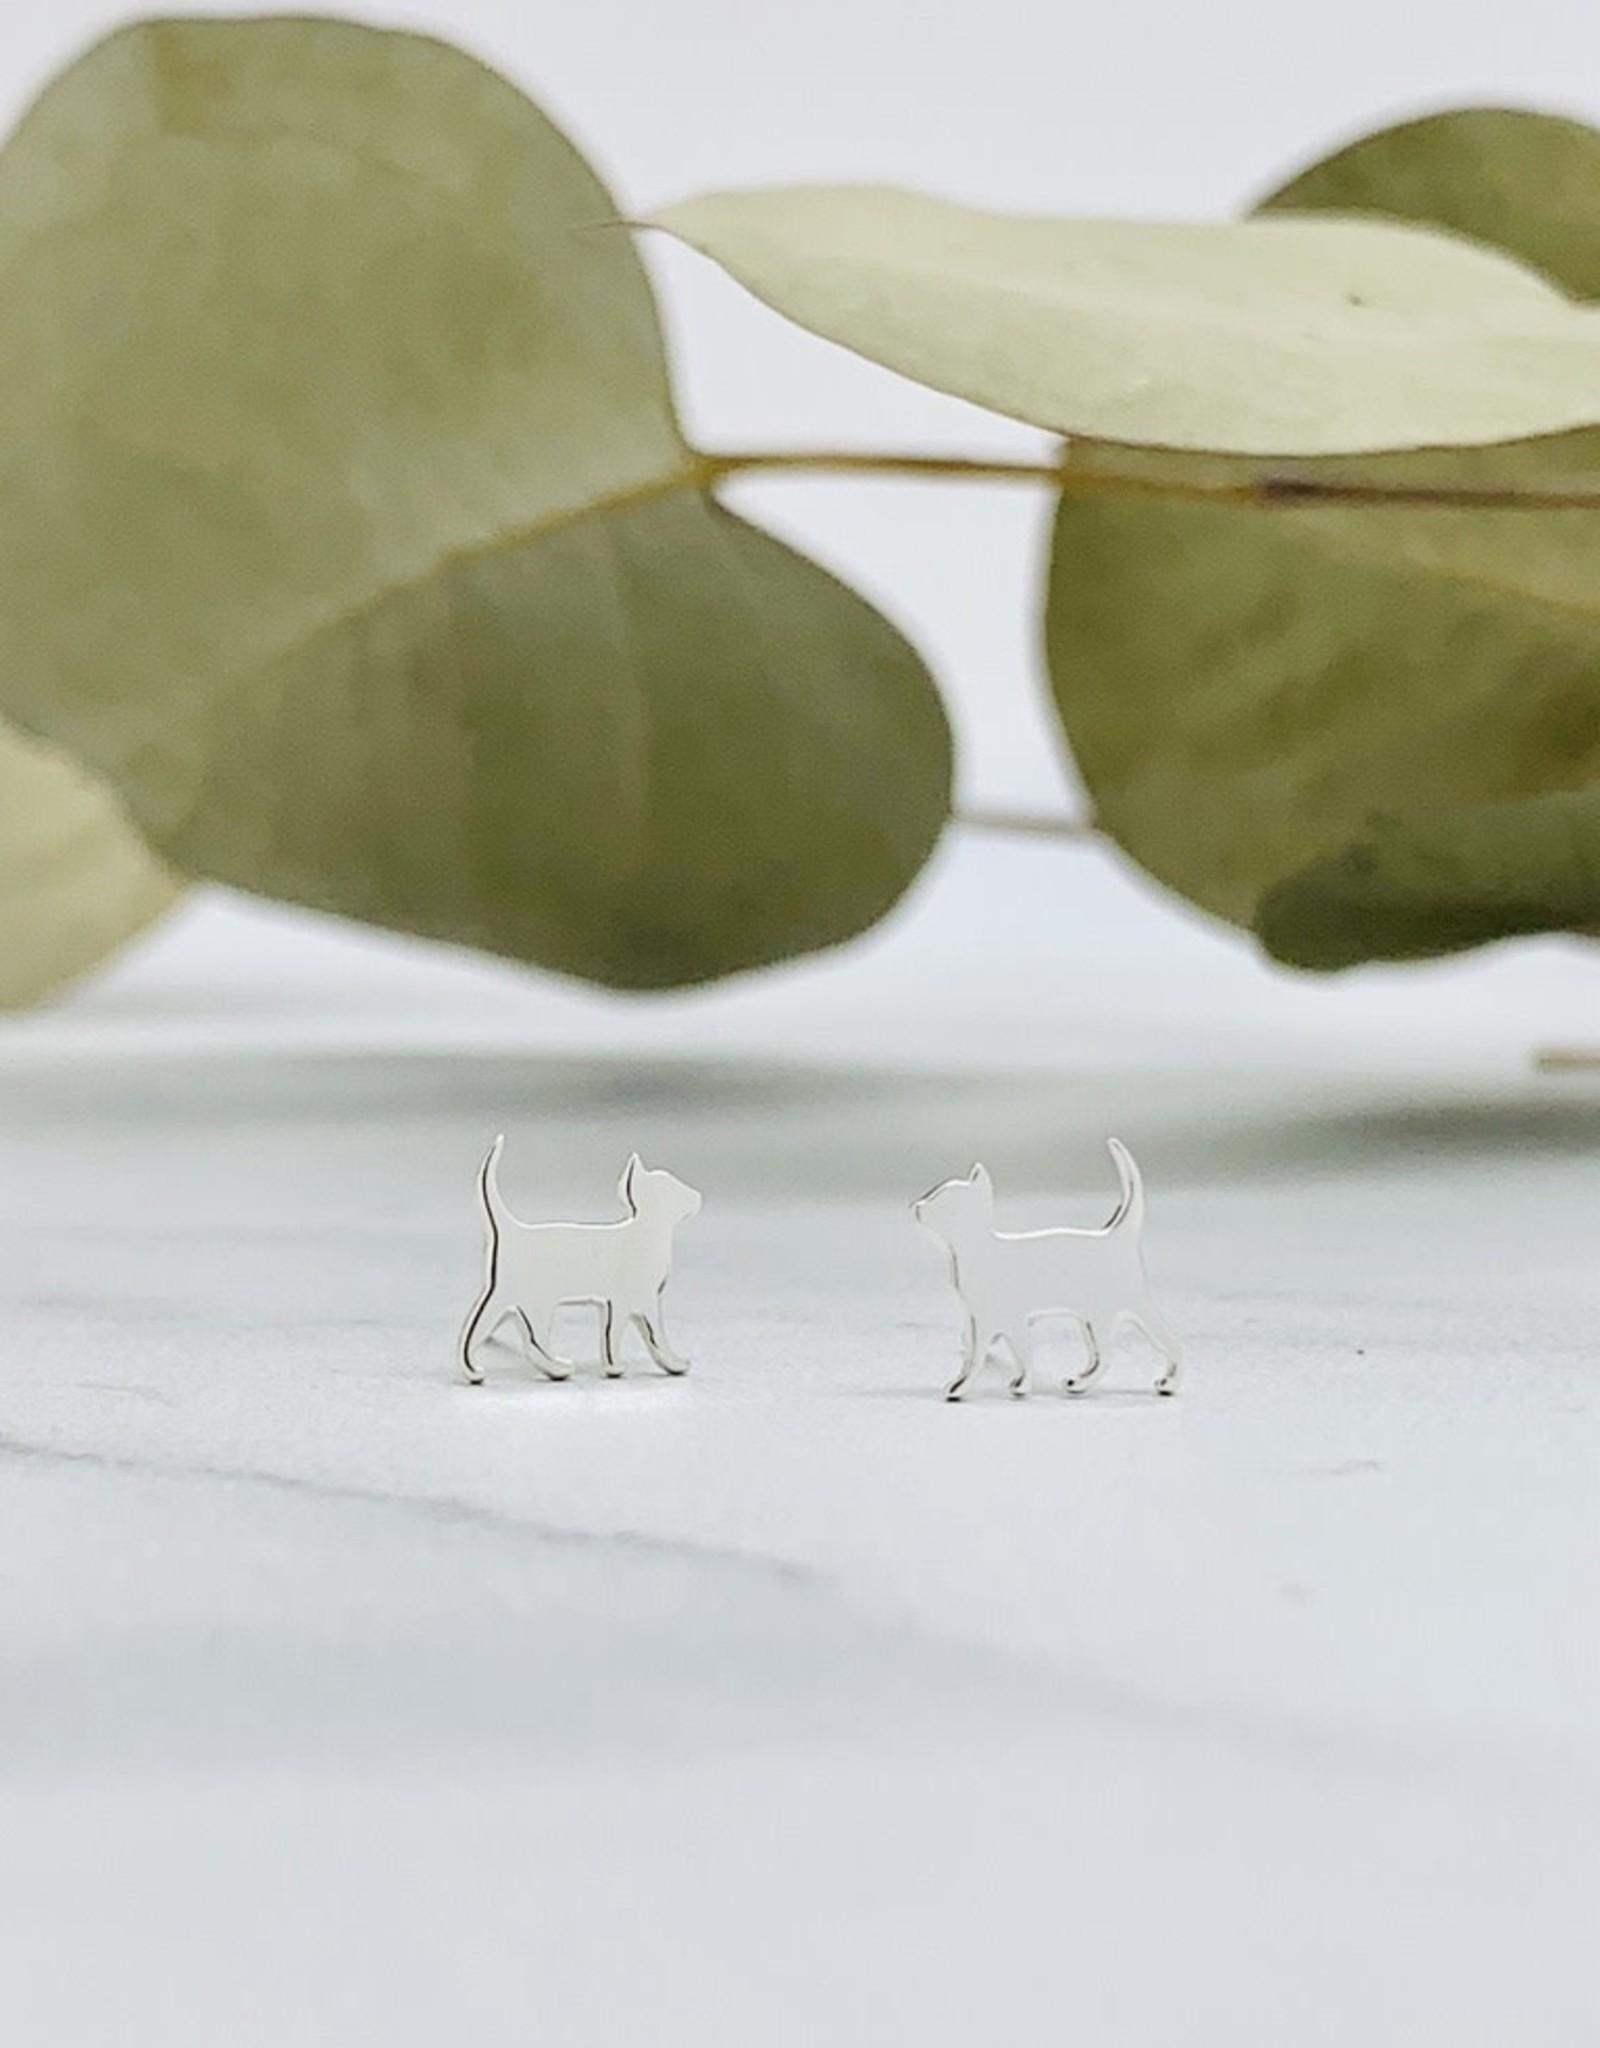 Nina Designs Silver Curious Kitten Post Earrings, 8x9mm